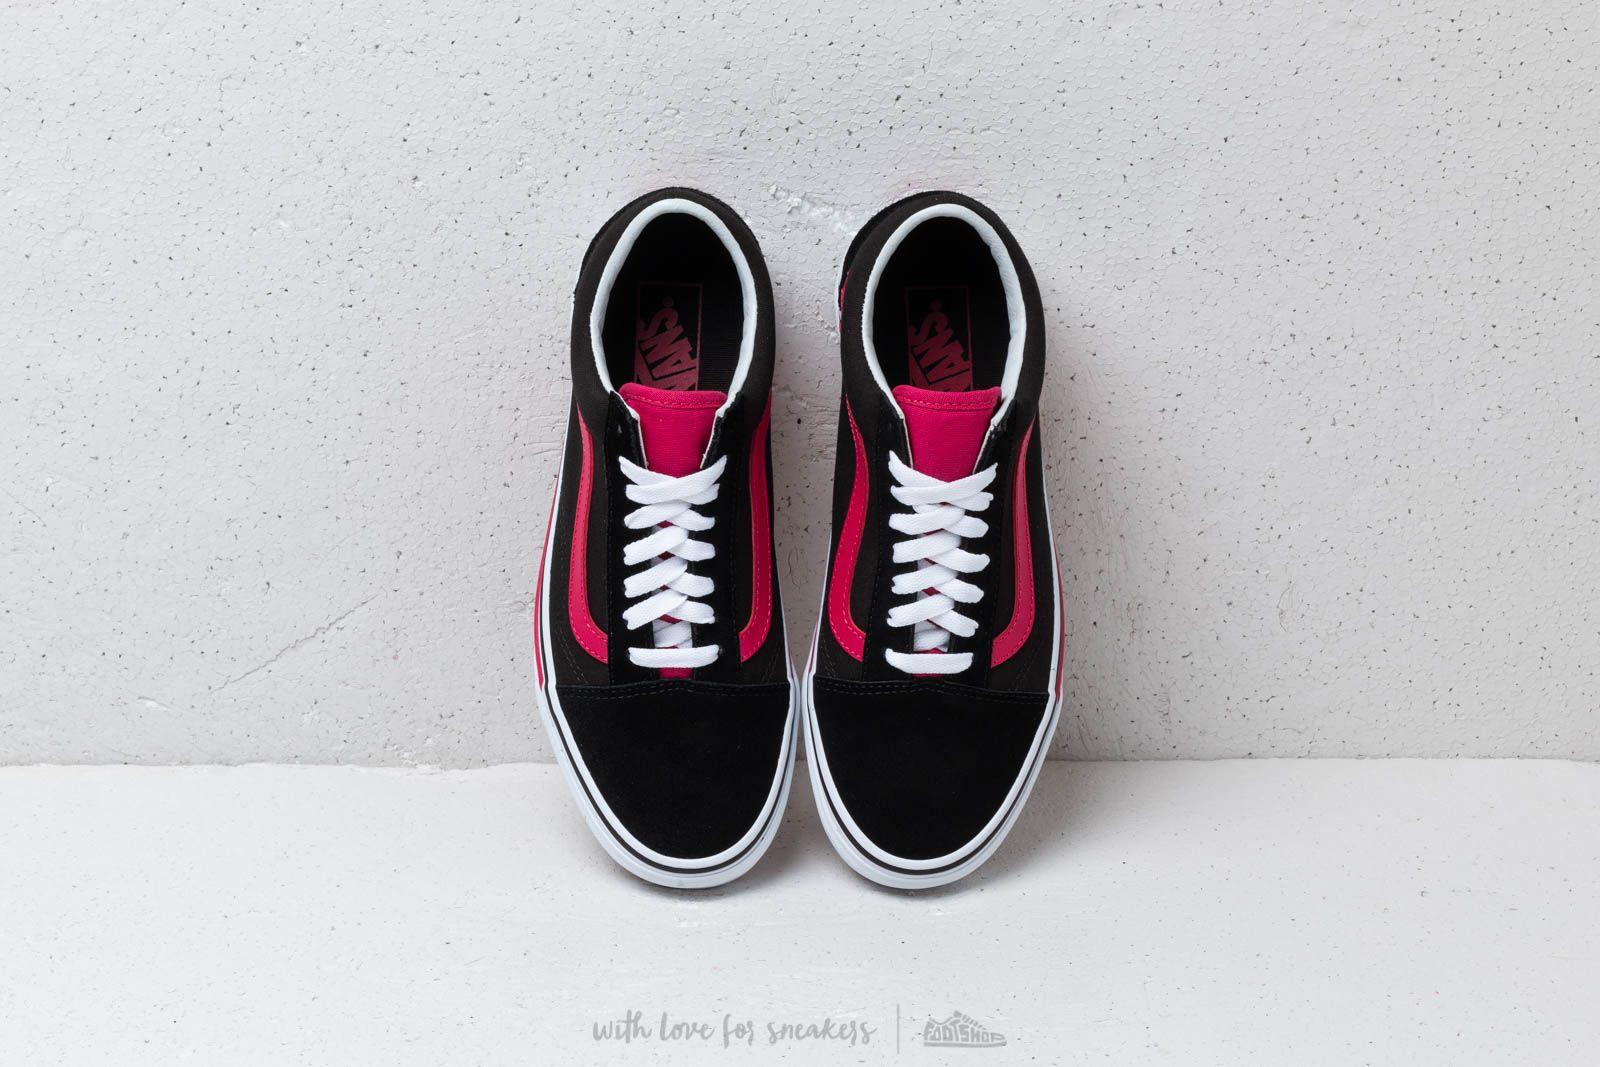 Men's shoes Vans Old Skool (Color Block